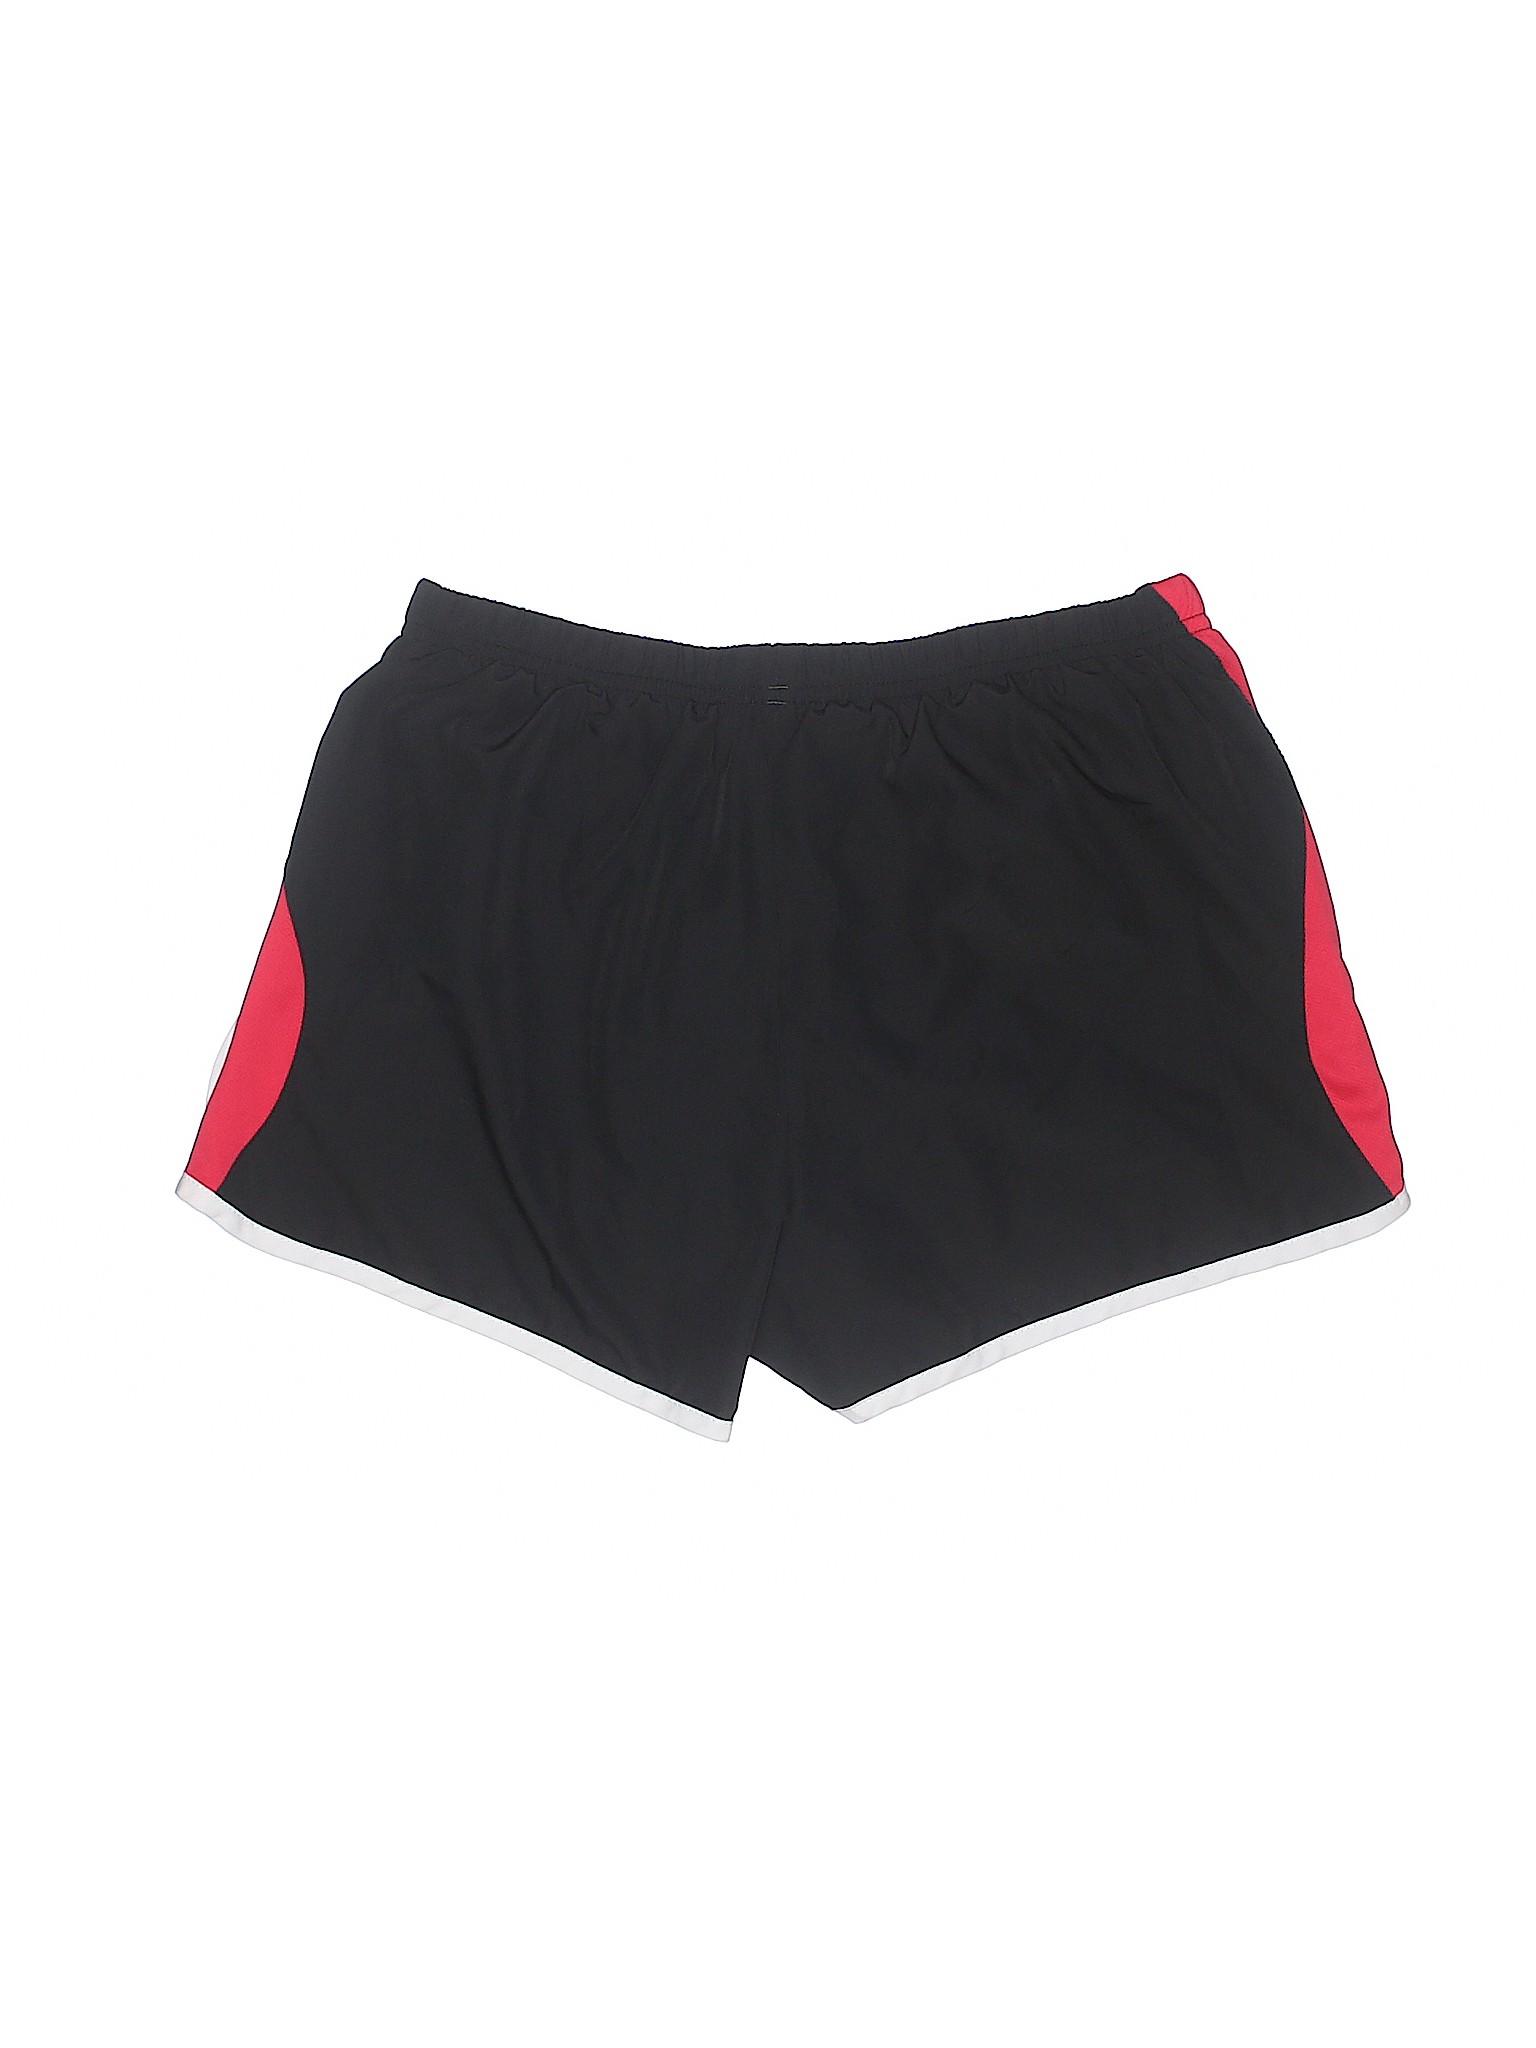 Boutique Boutique New Shorts Athletic Balance New wPq5C88xn